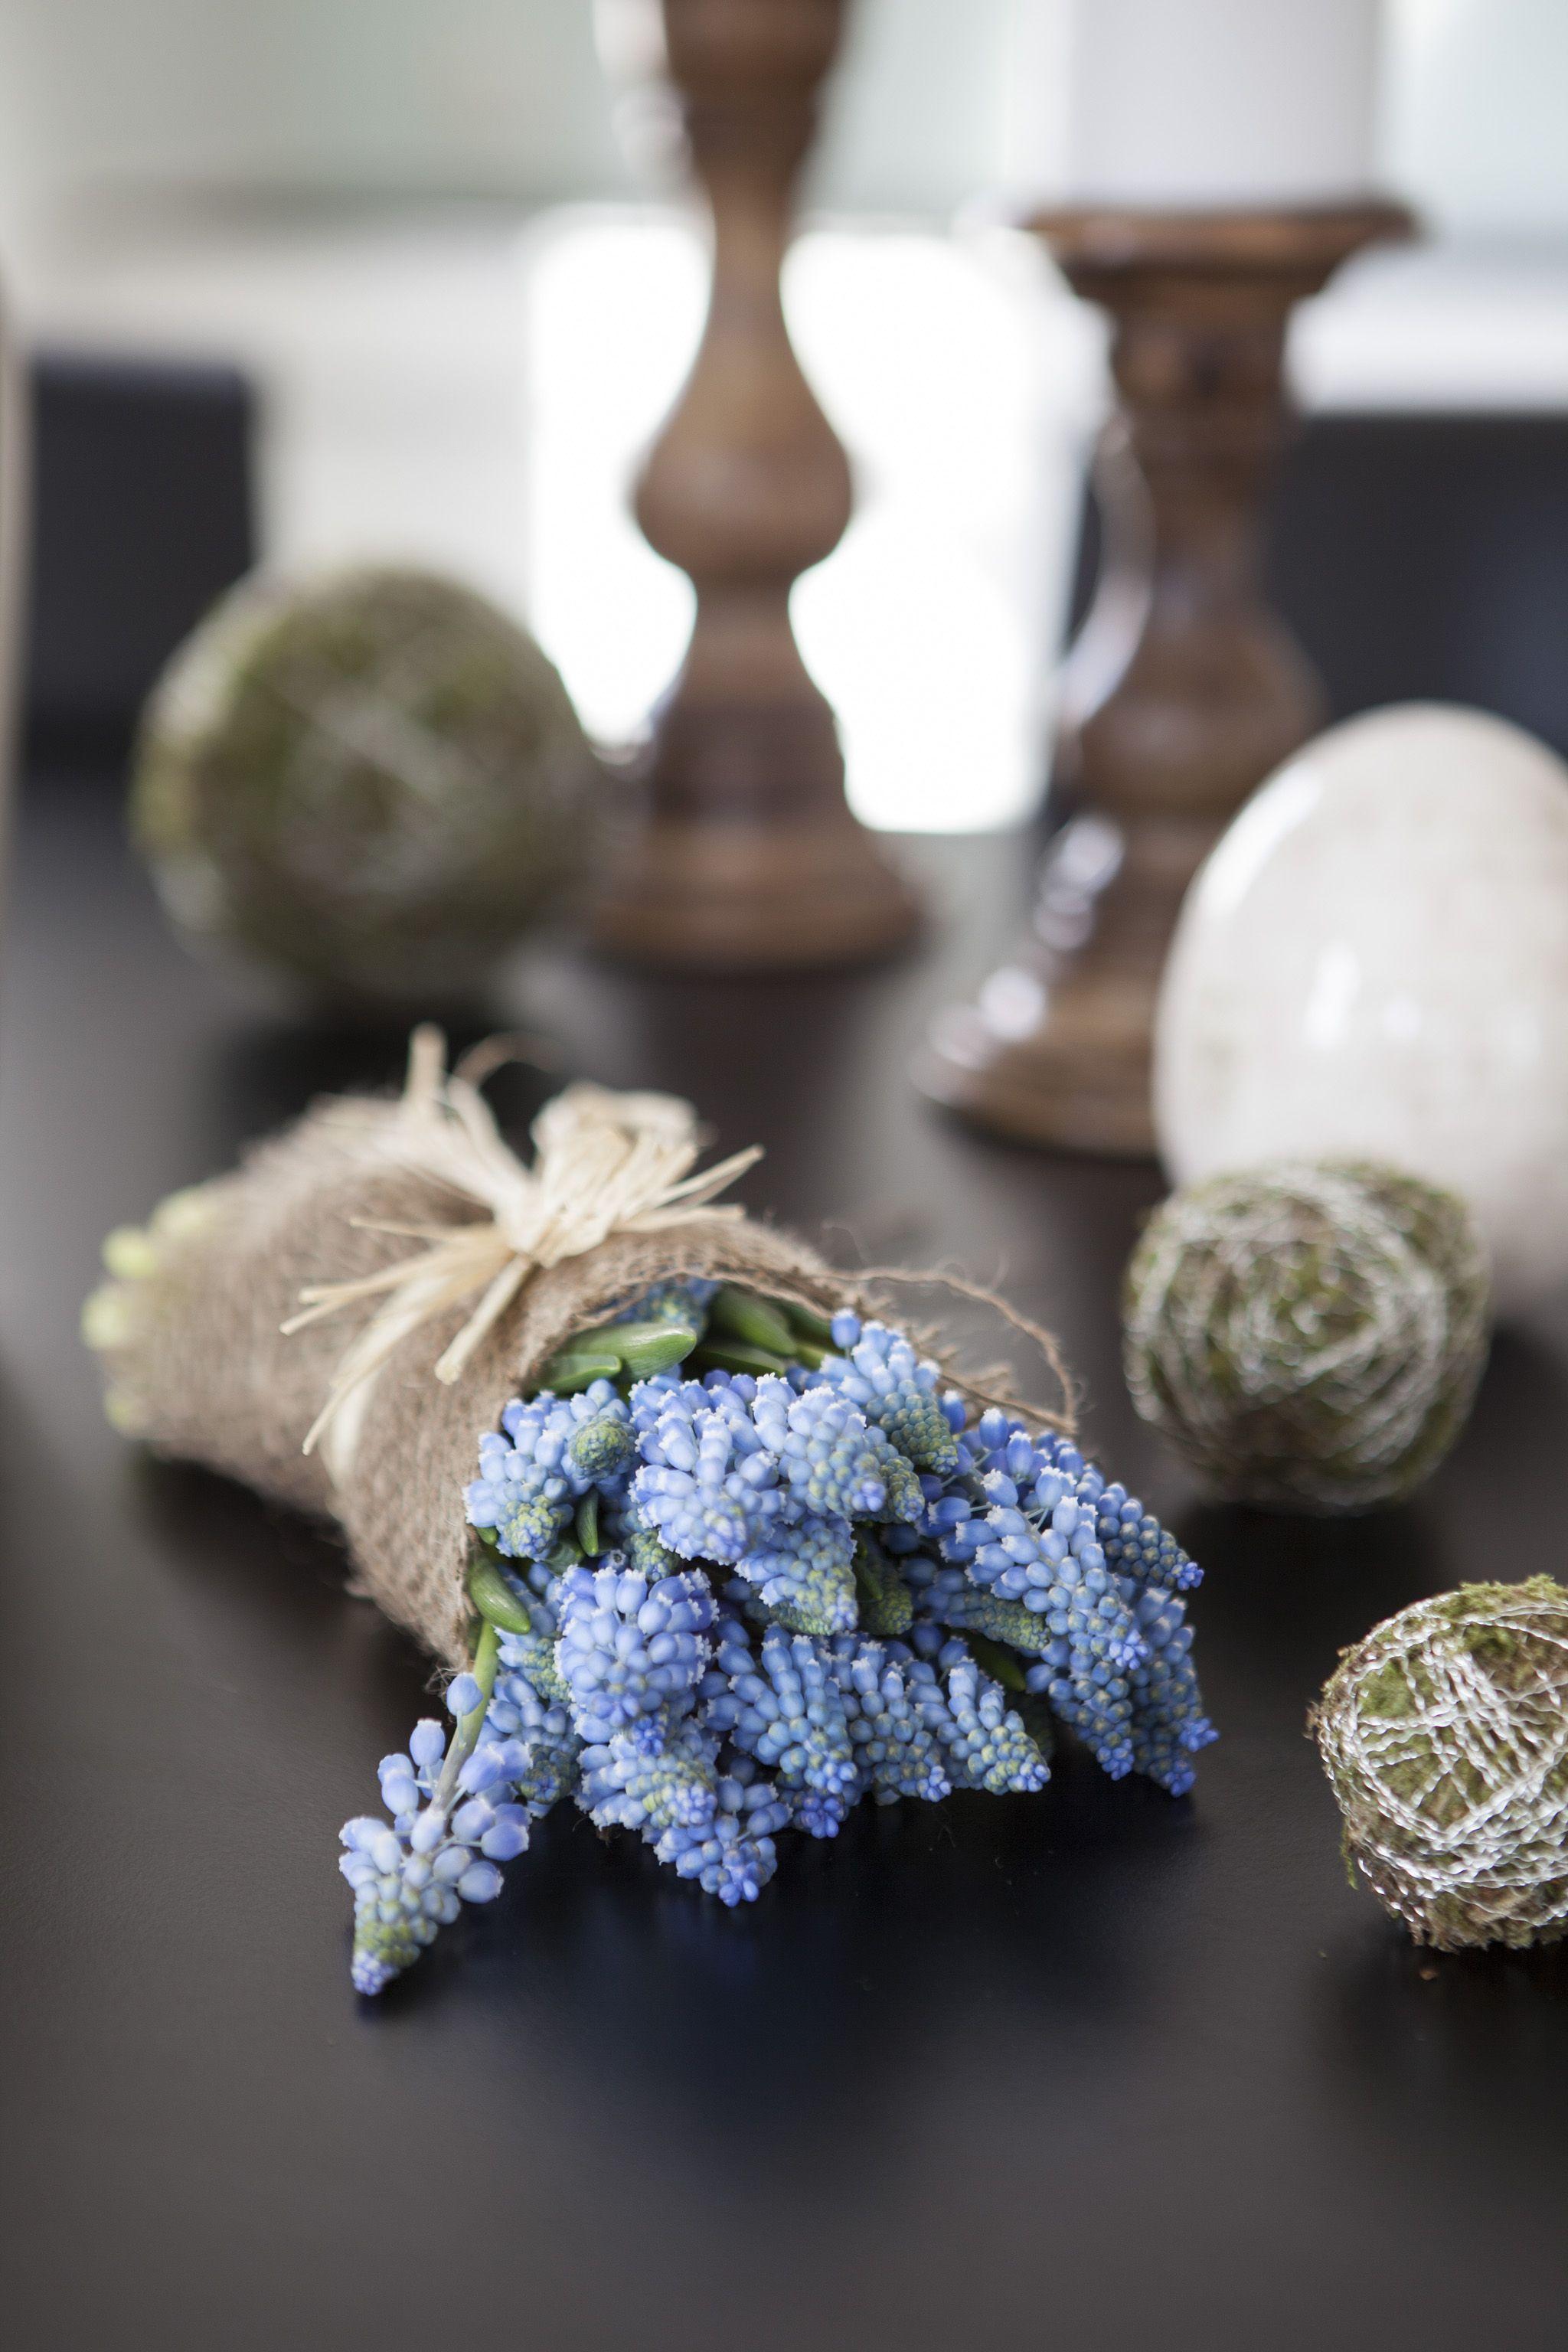 Muscari eller perleblomst, gir vårstmning i huset